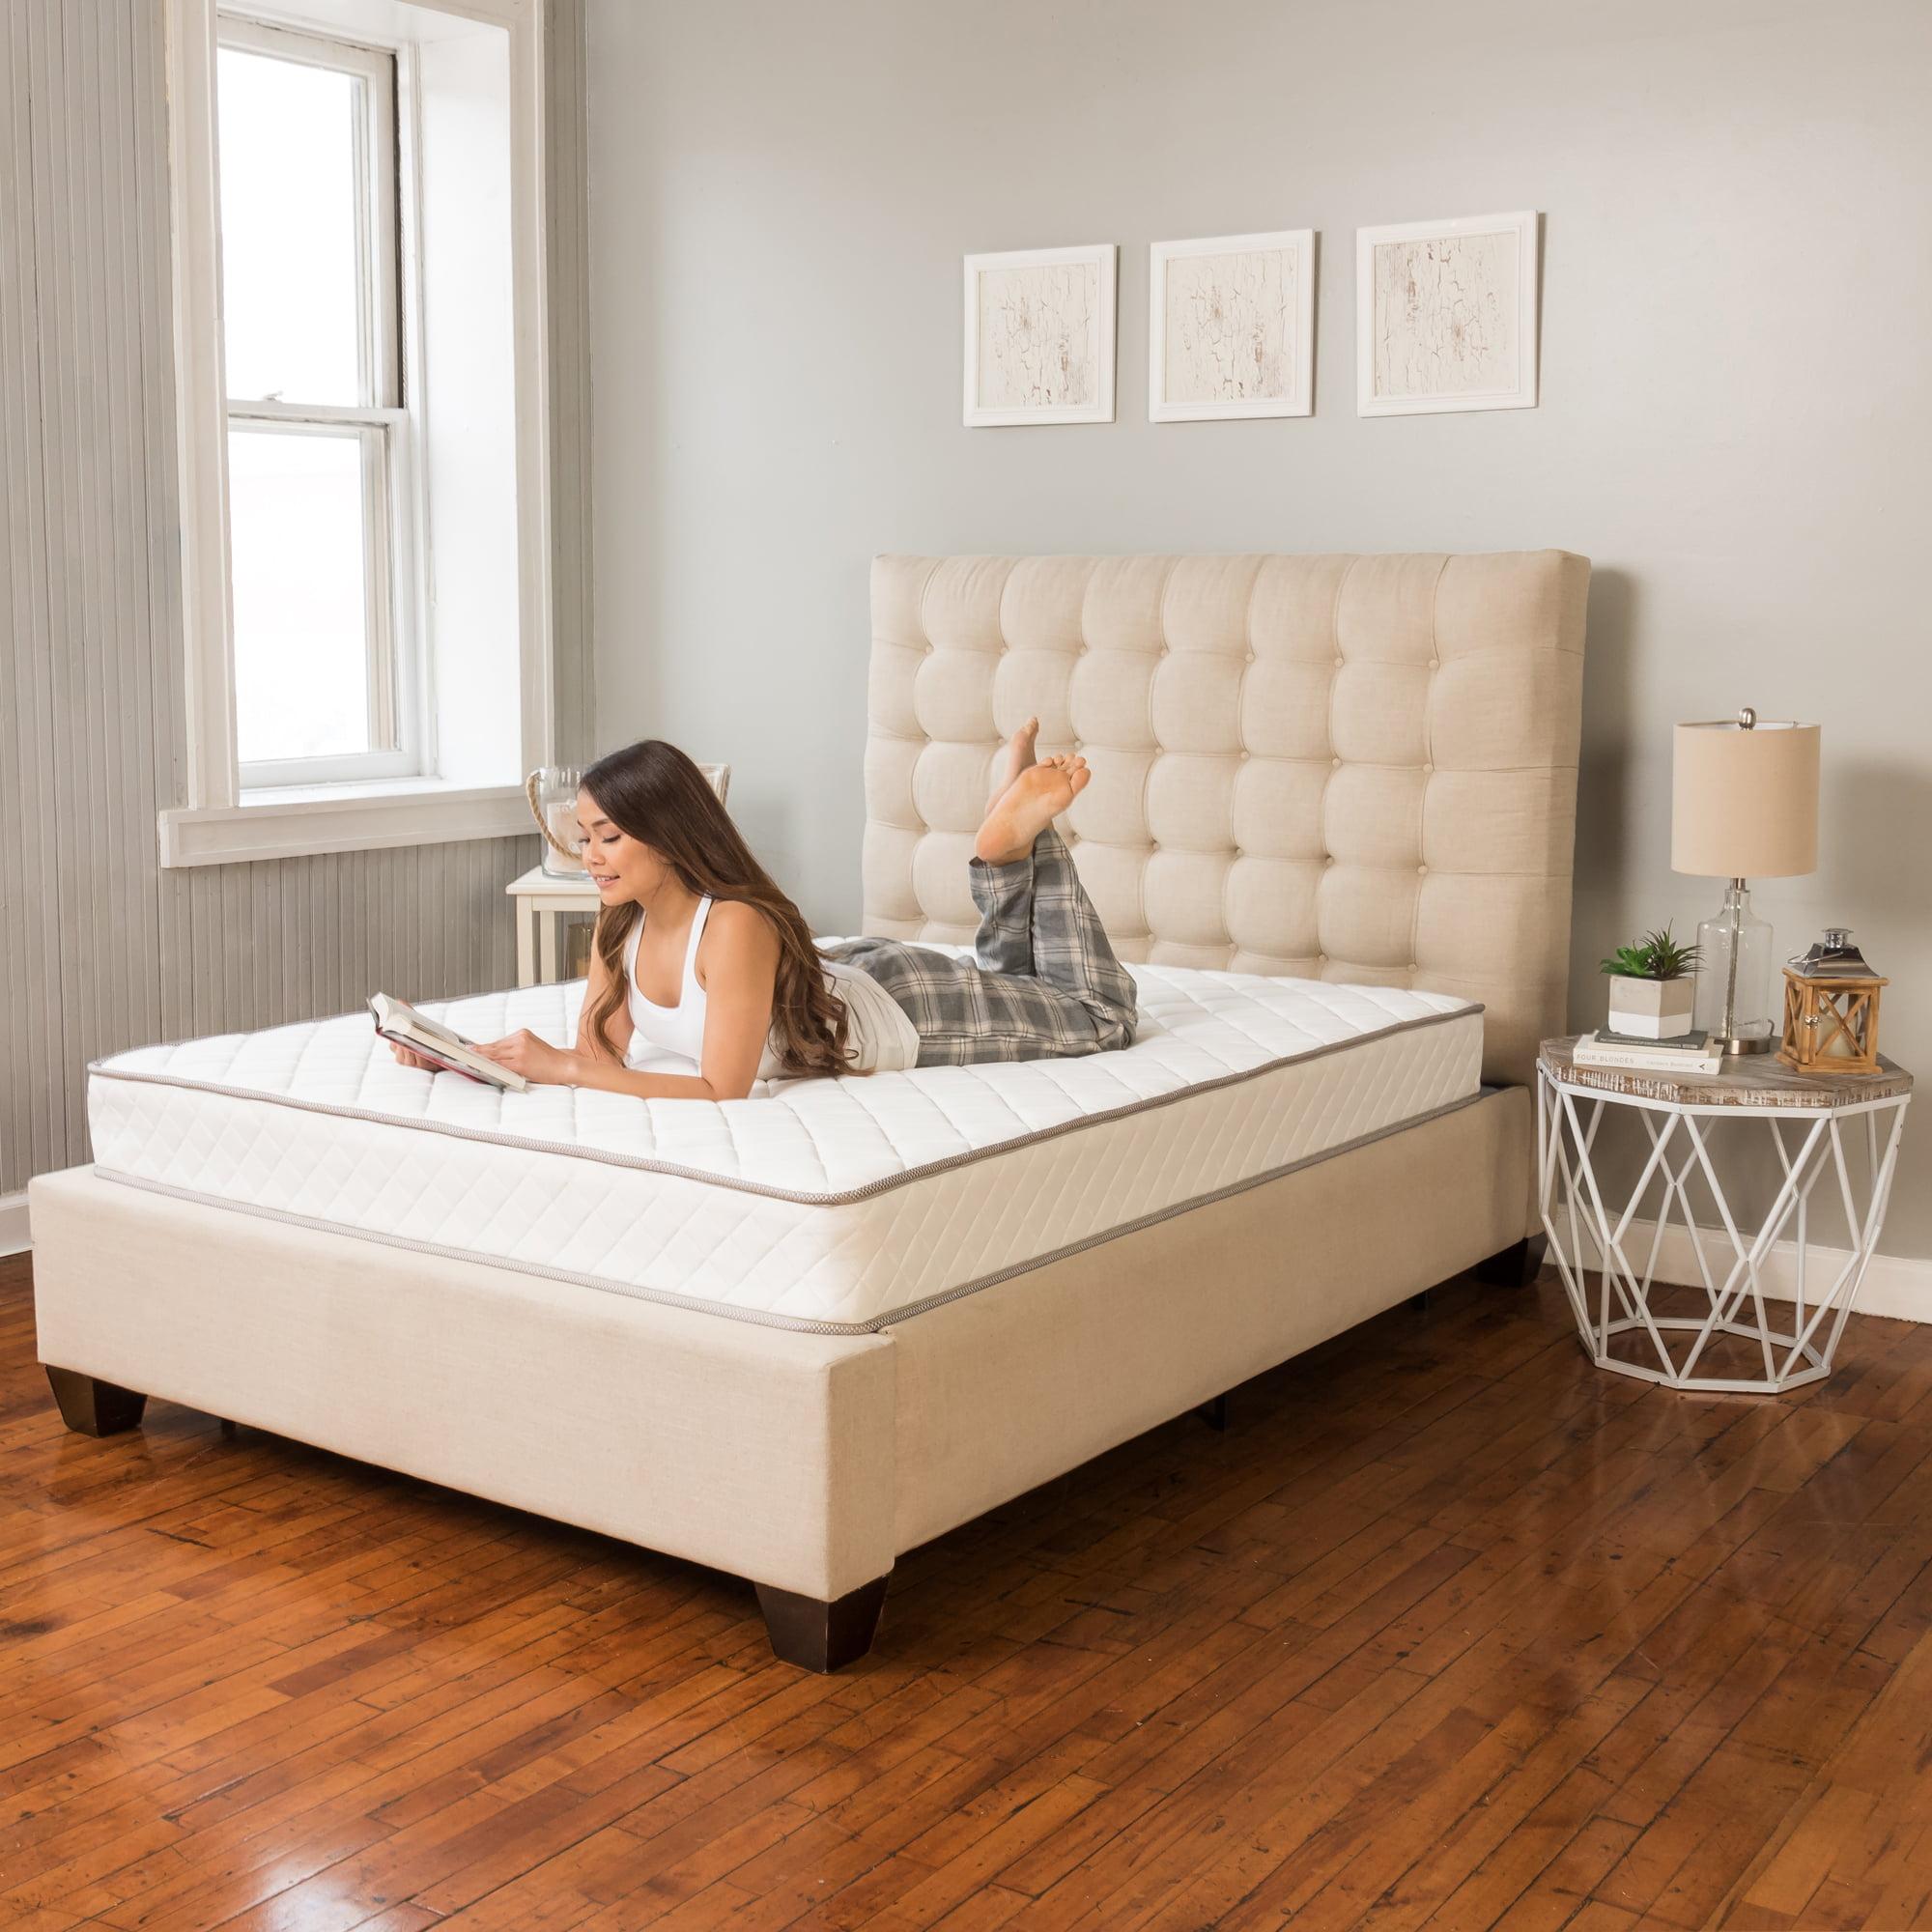 Modern Sleep Innerspring 7-Inch Mattress, Multiple Sizes by Classic Brands